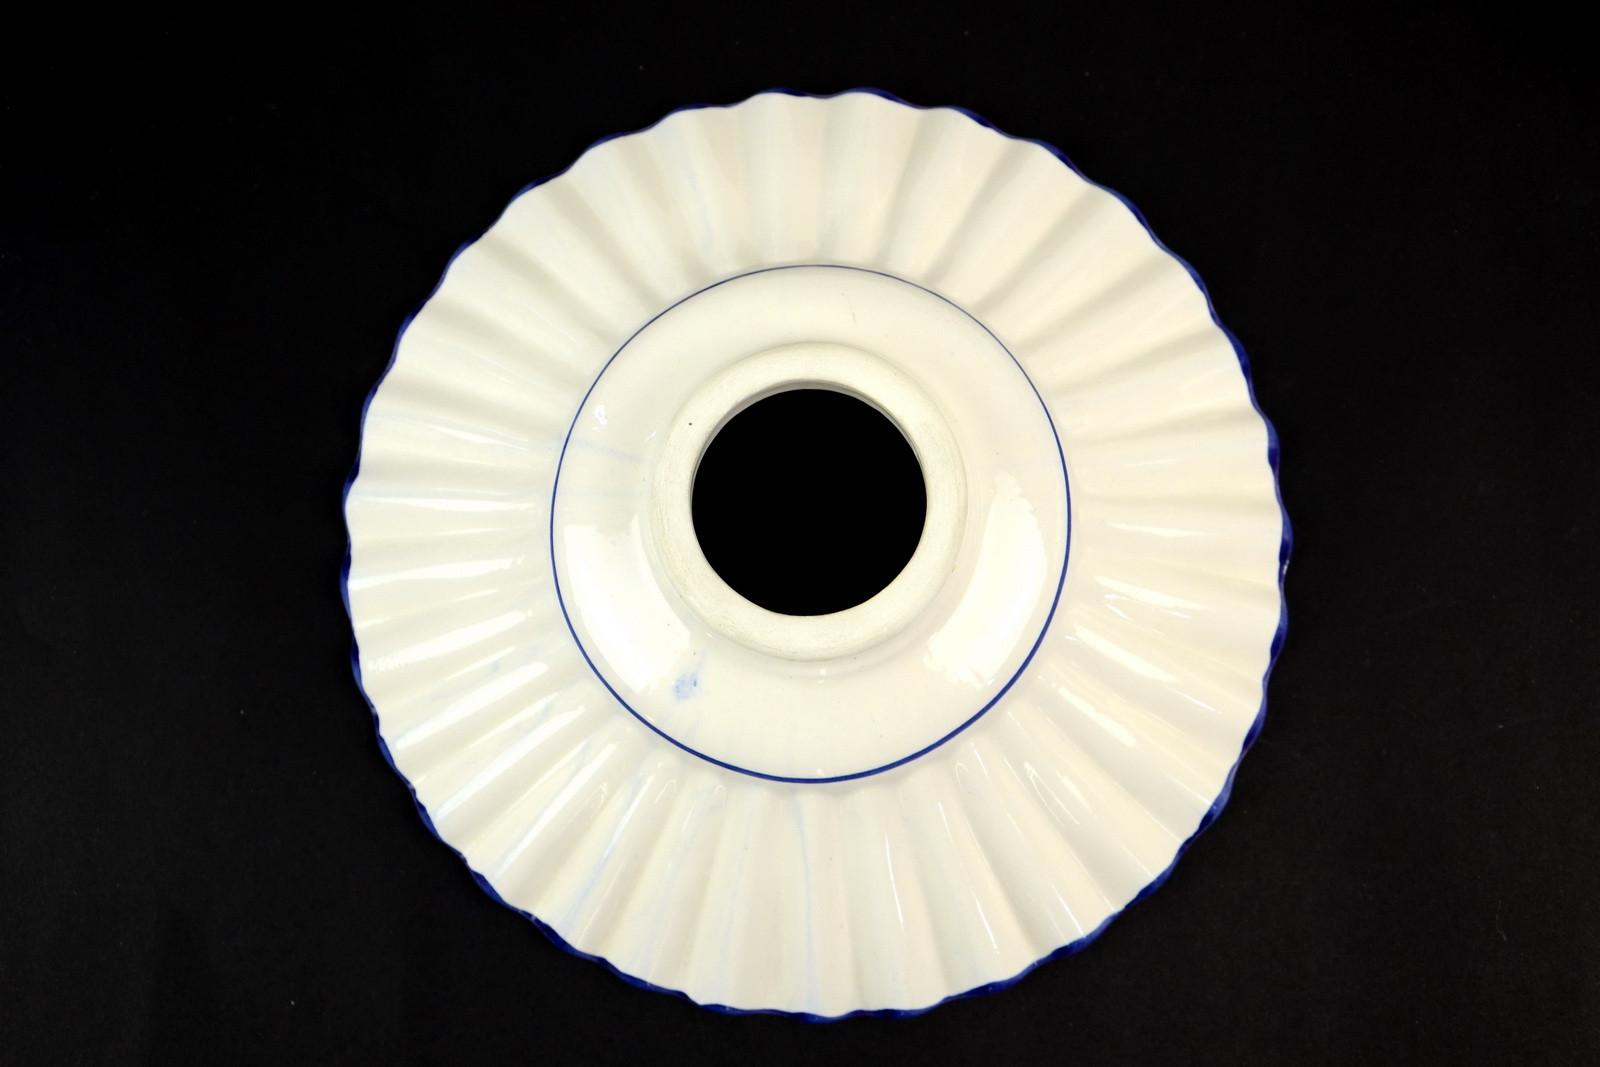 pv101b-piatto-luce-in-ceramica-cm-19-4,1348.jpg?WebbinsCacheCounter=1